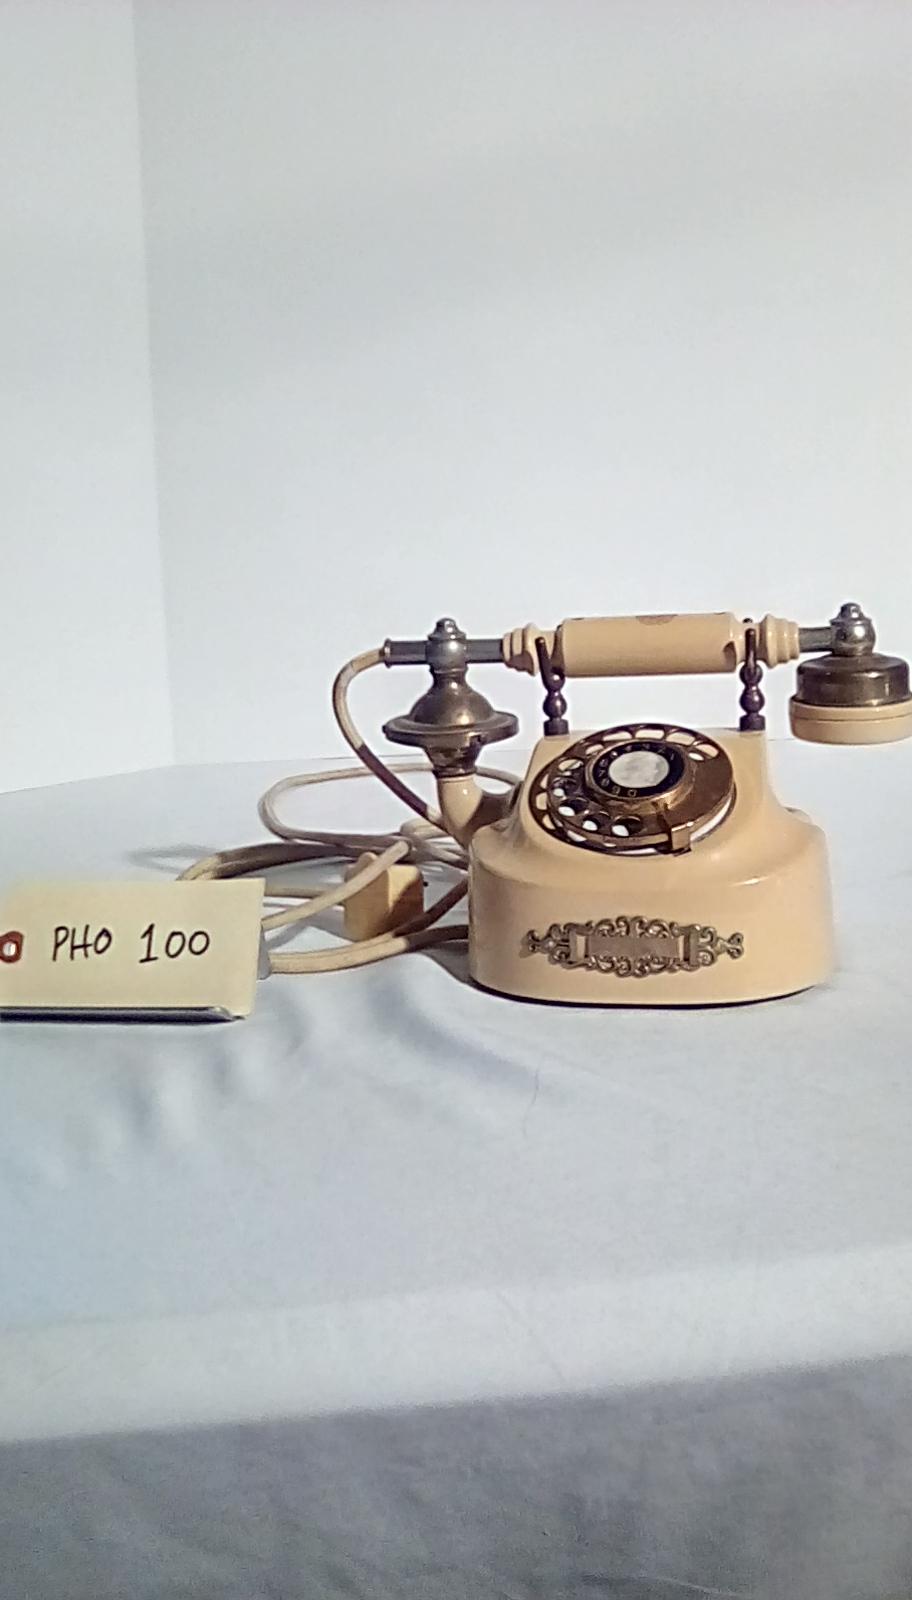 PHO100 1950's rotary  desk phone